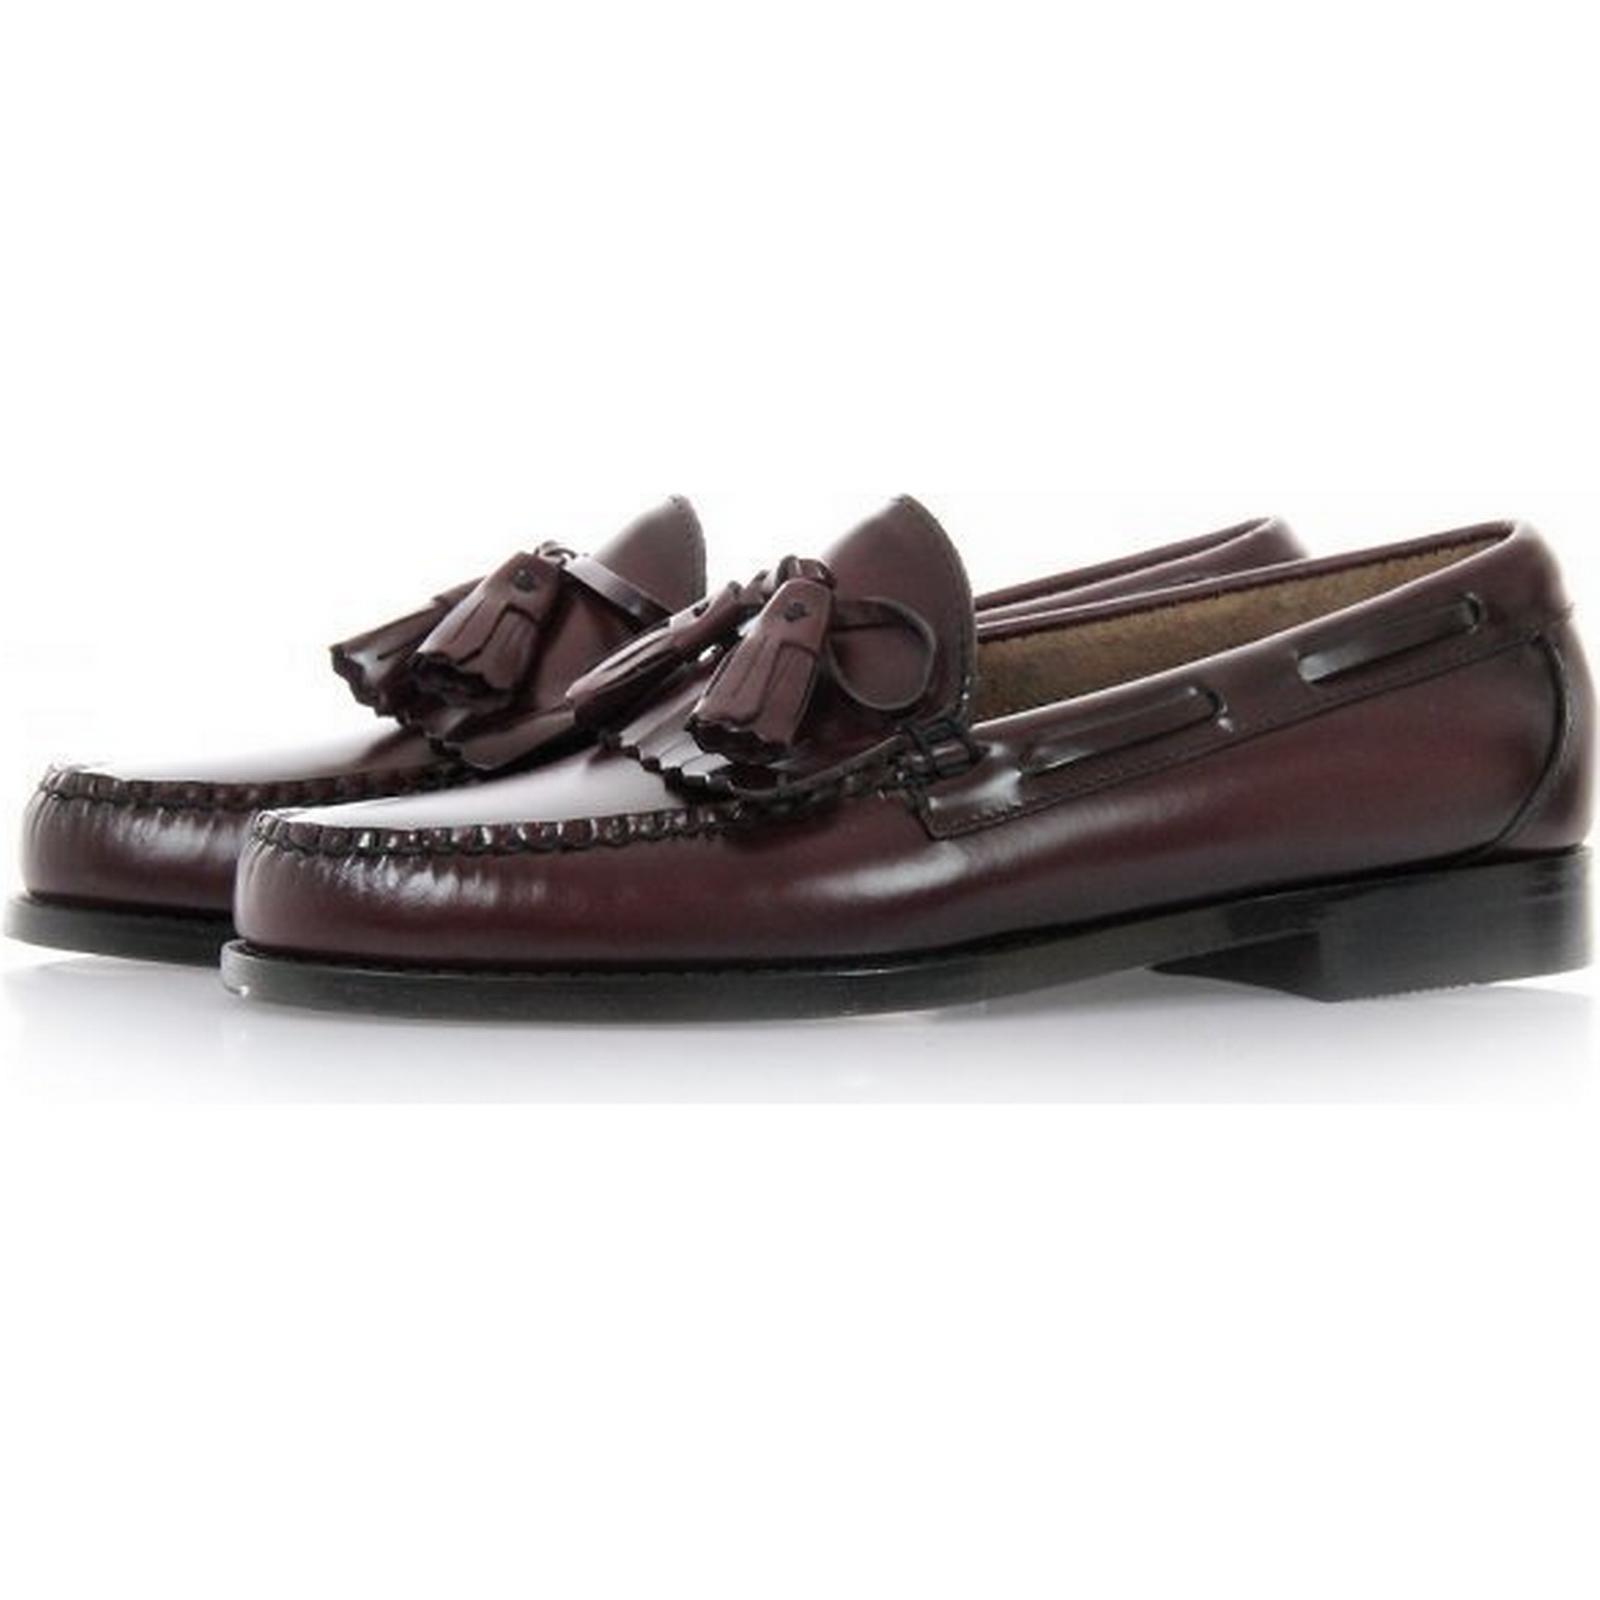 33535 Layton Moc Loafers Kiltie Tassle Loafers Moc - Wine 06626f